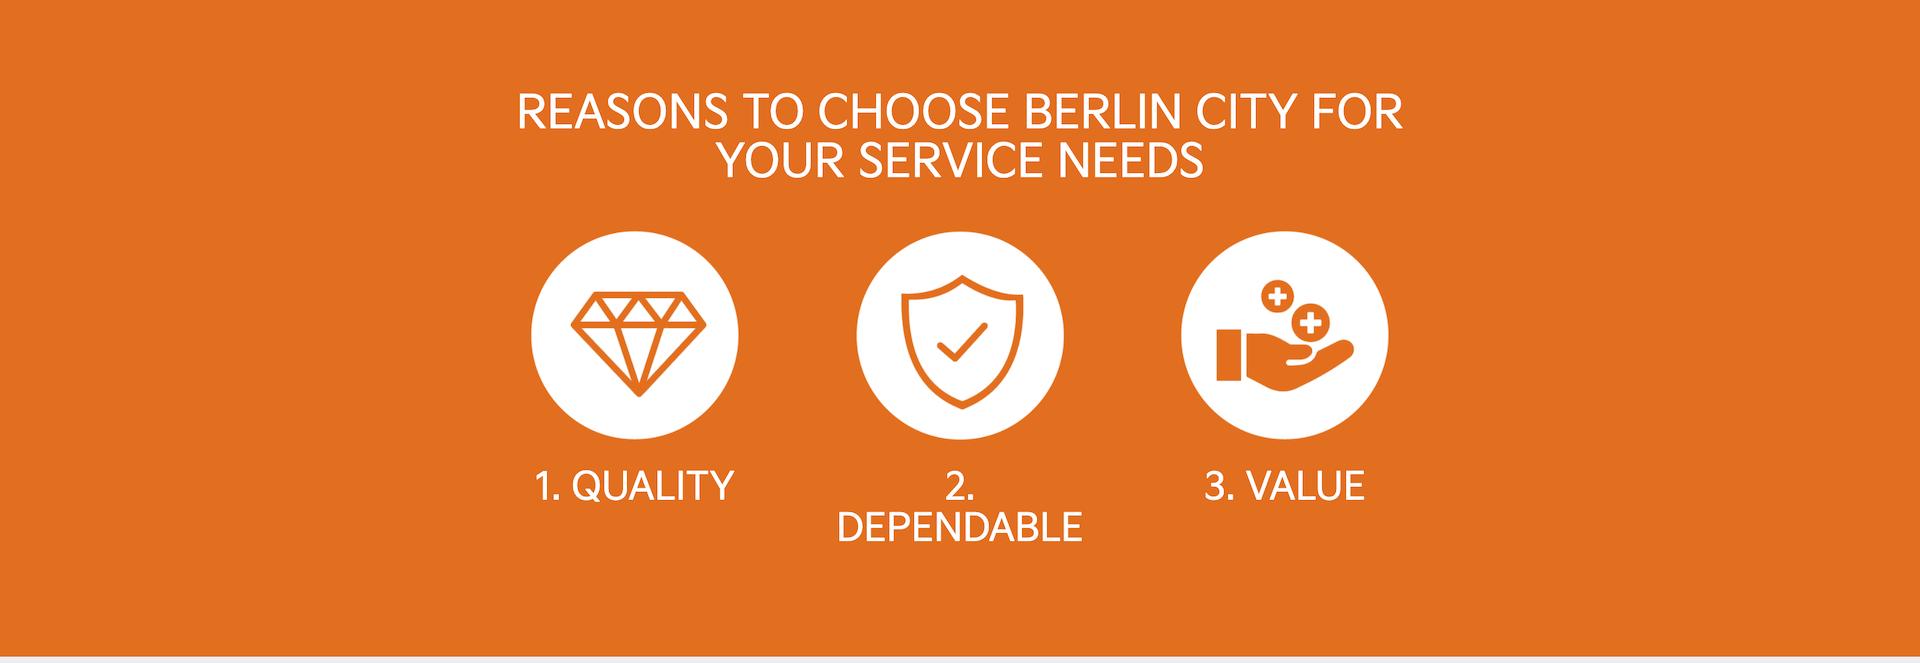 Berlin City Care Program Icons